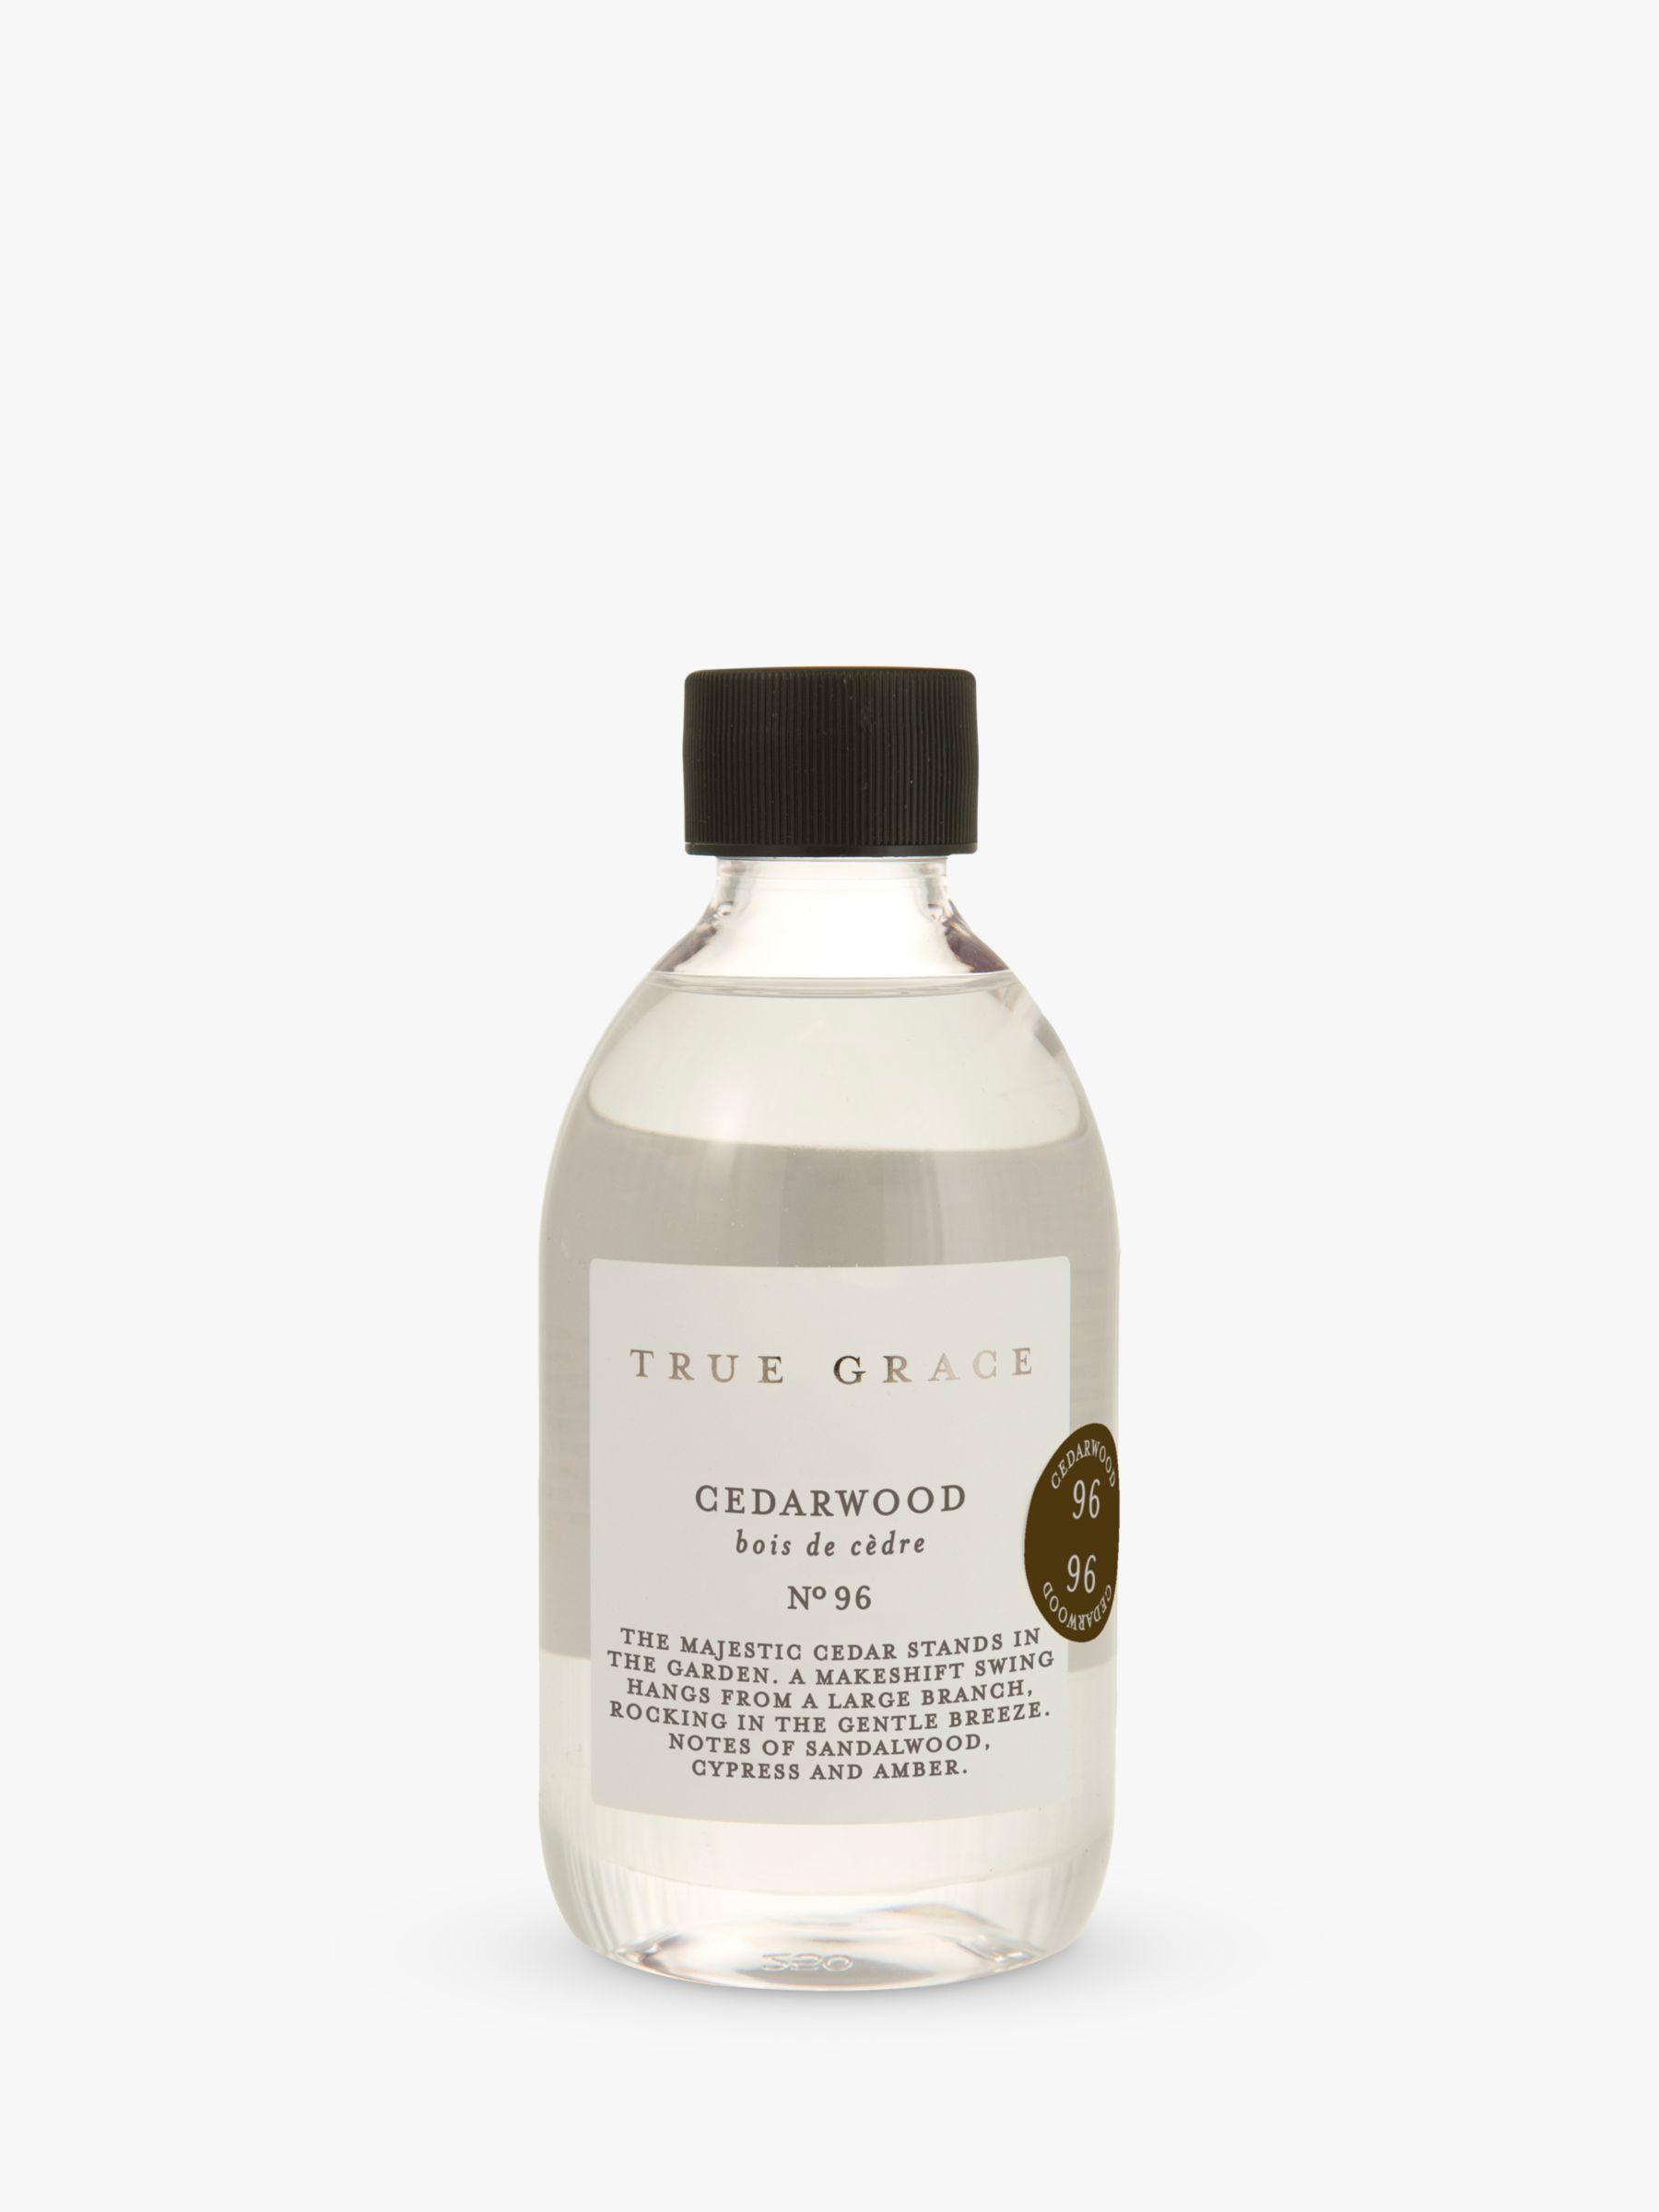 True Grace True Grace Cedarwood Diffuser Refill, 250ml